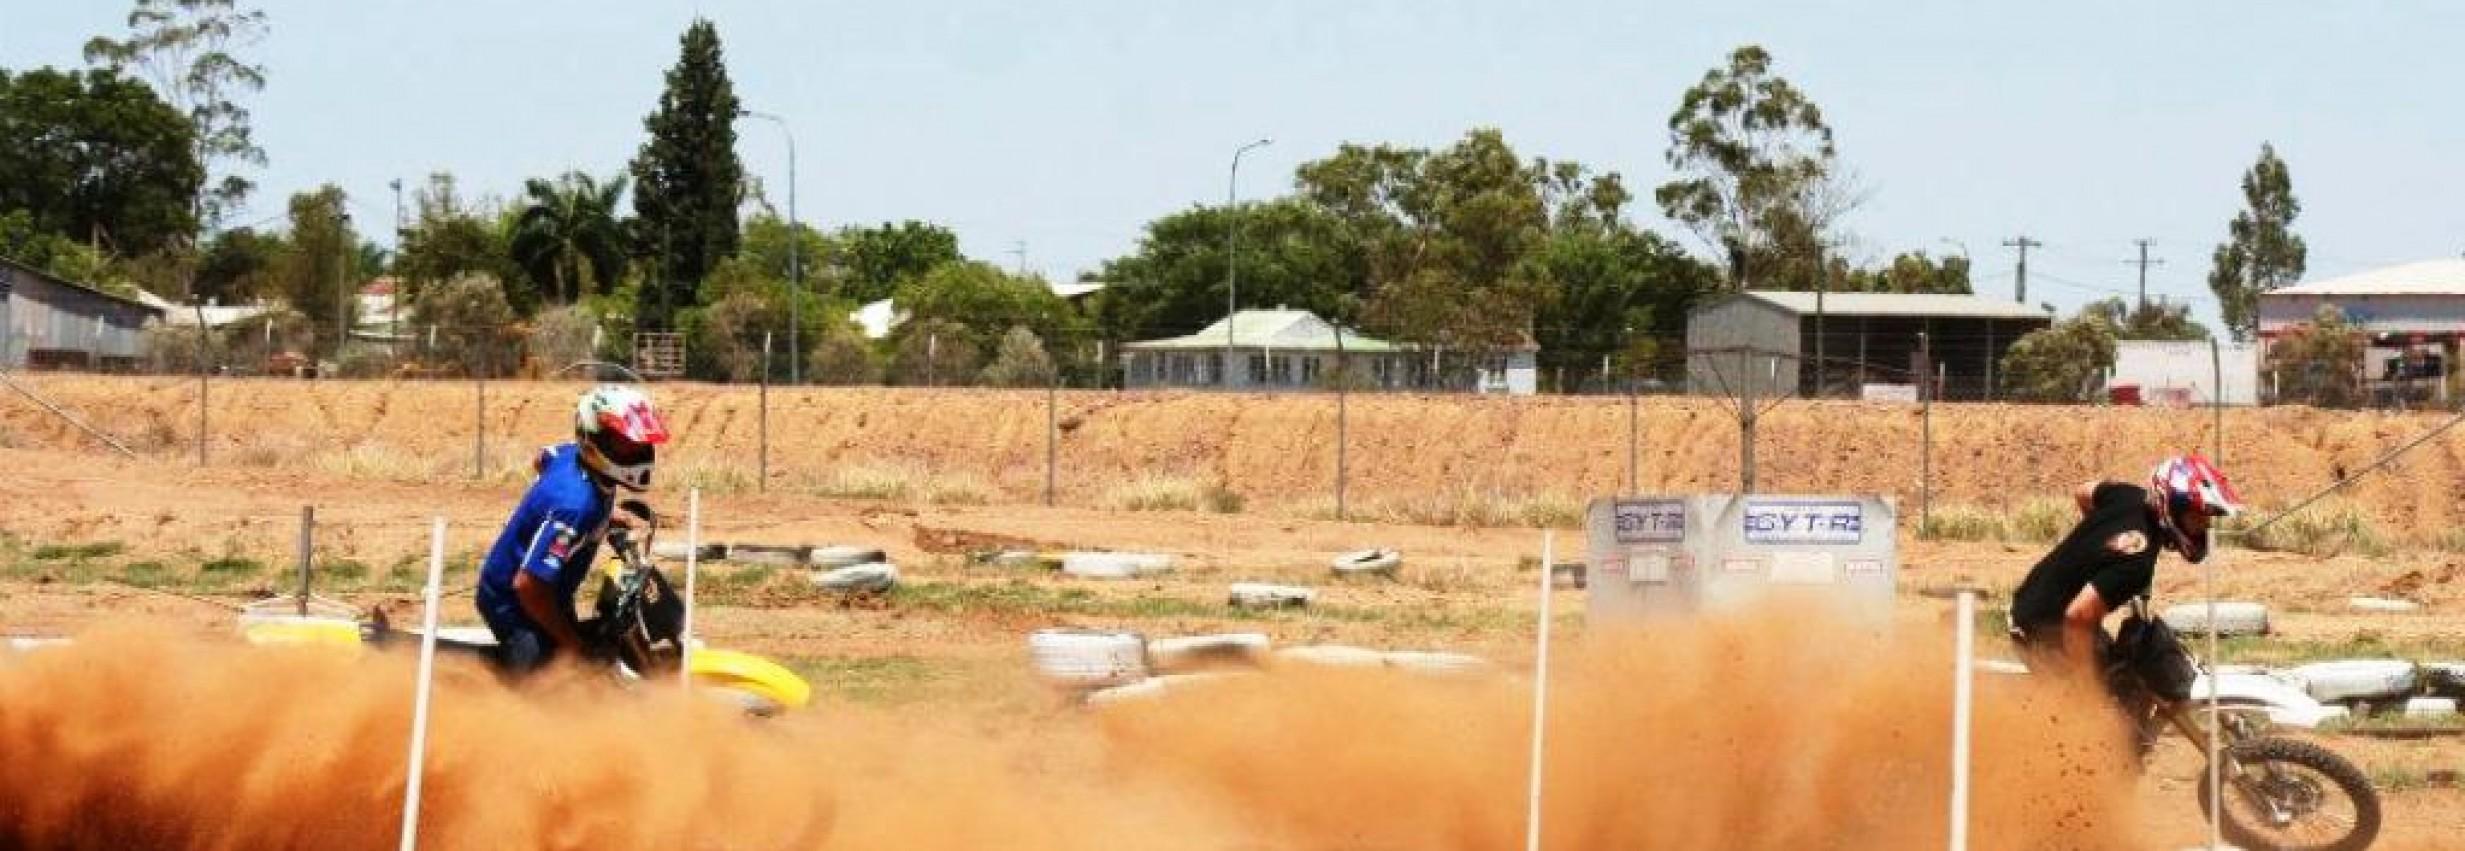 Longreach Motocross Track